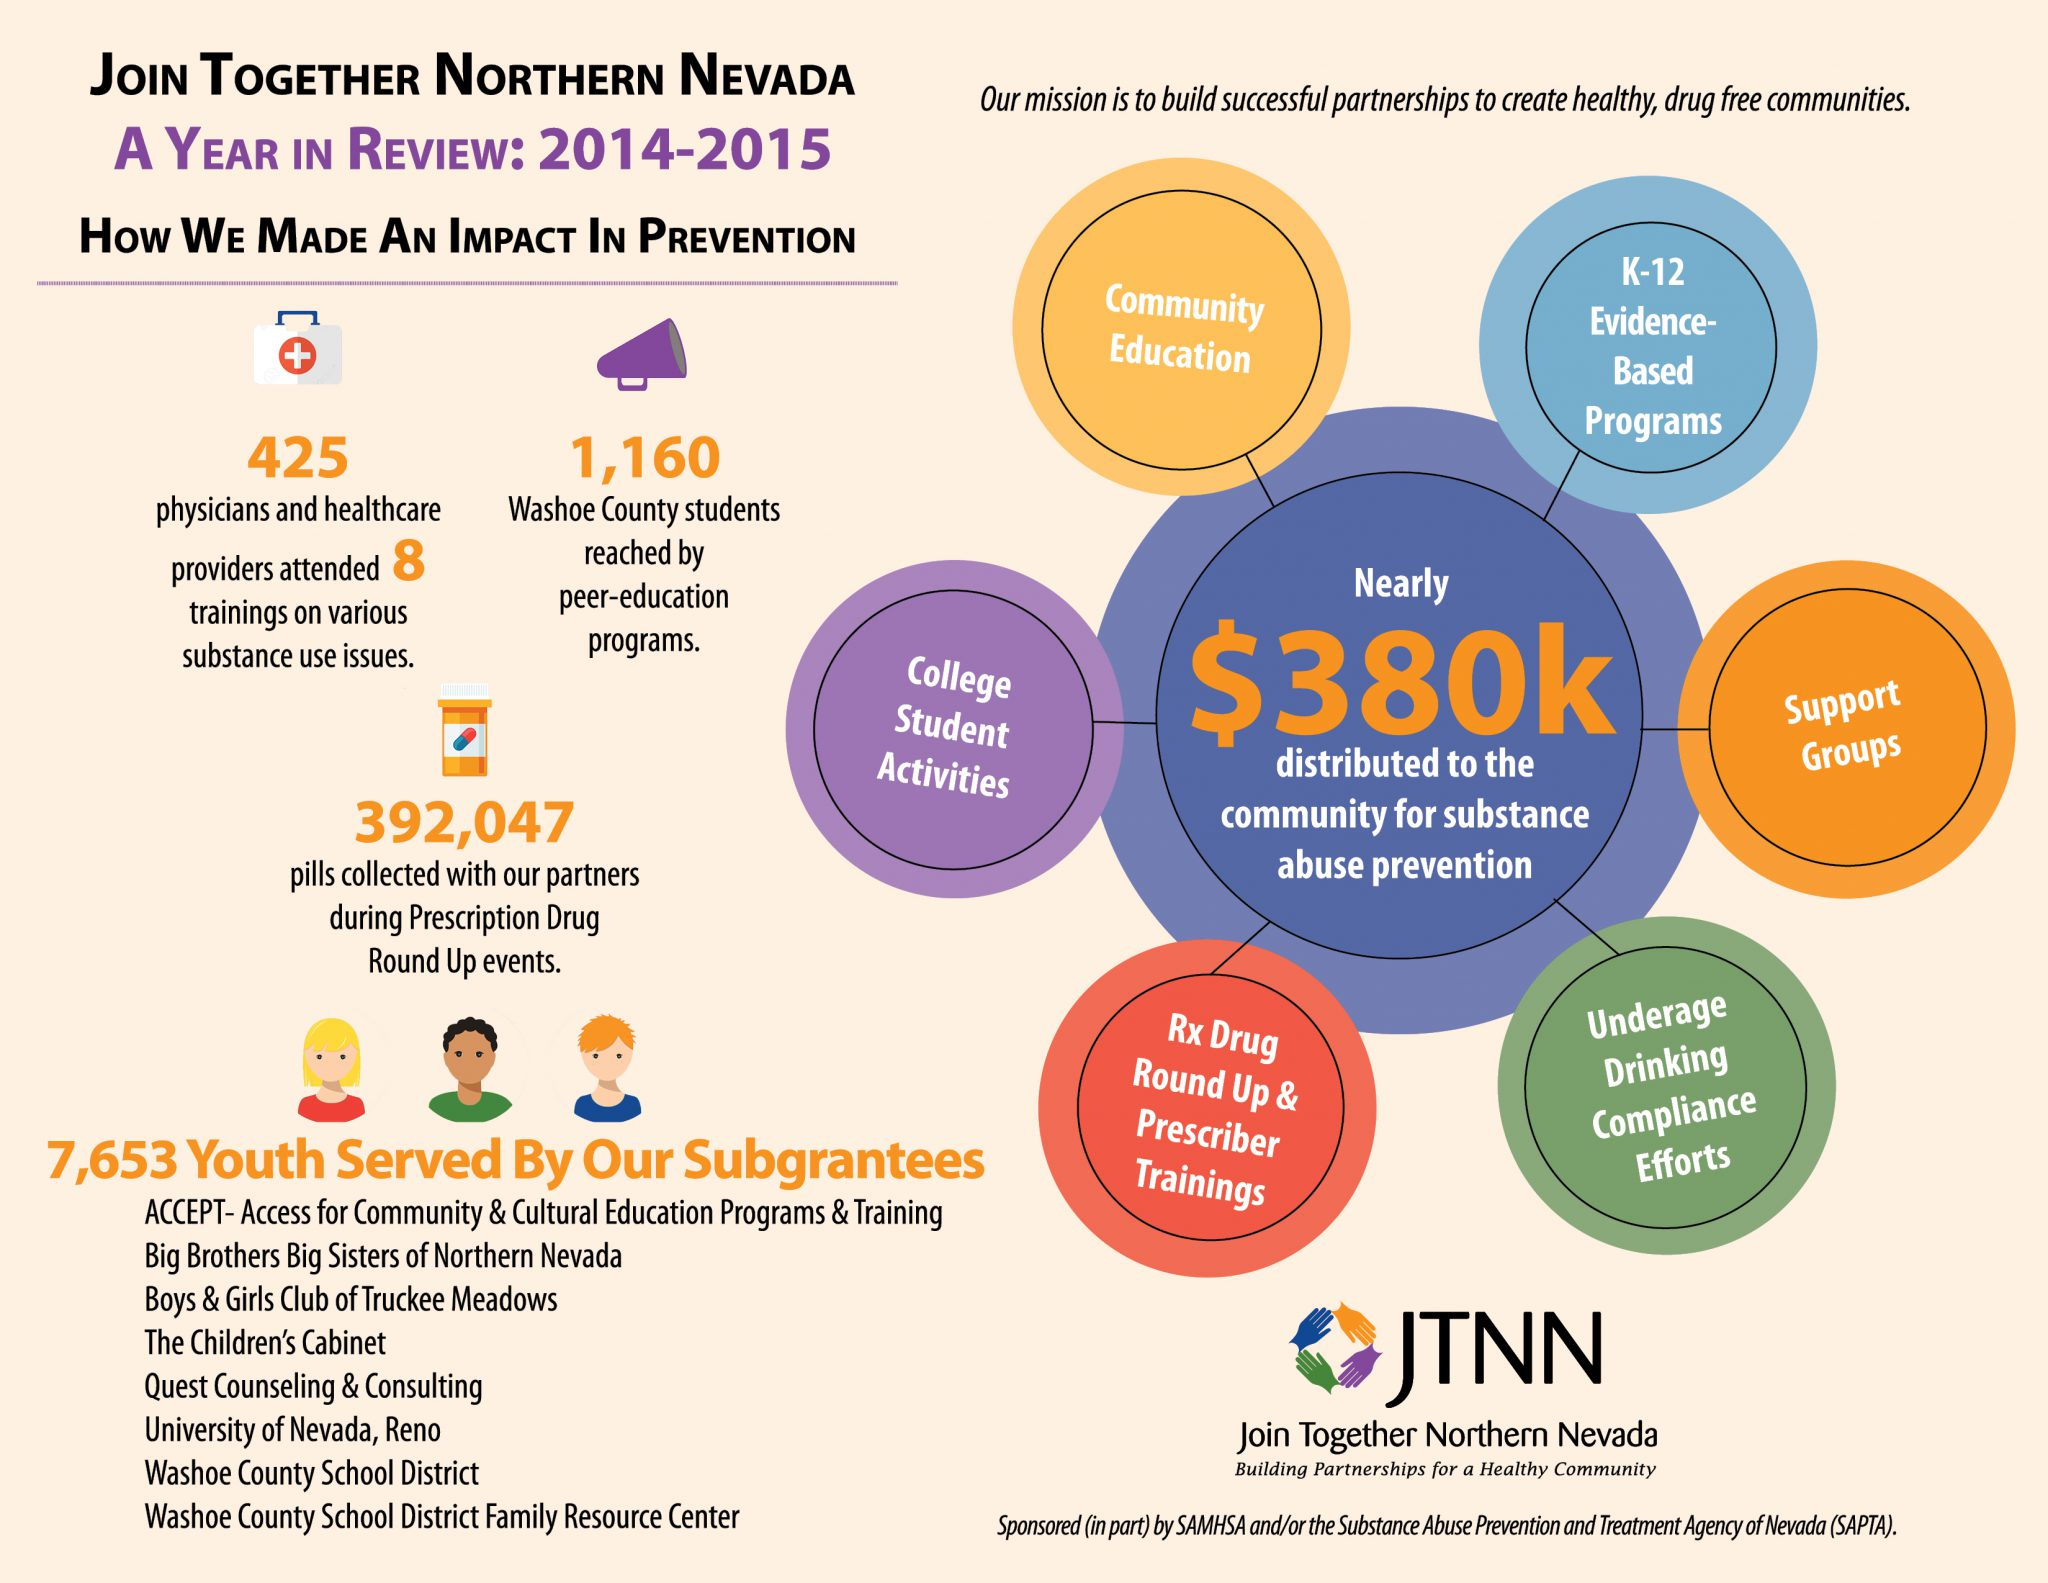 JTNN 14-15 Annual Report Infographic